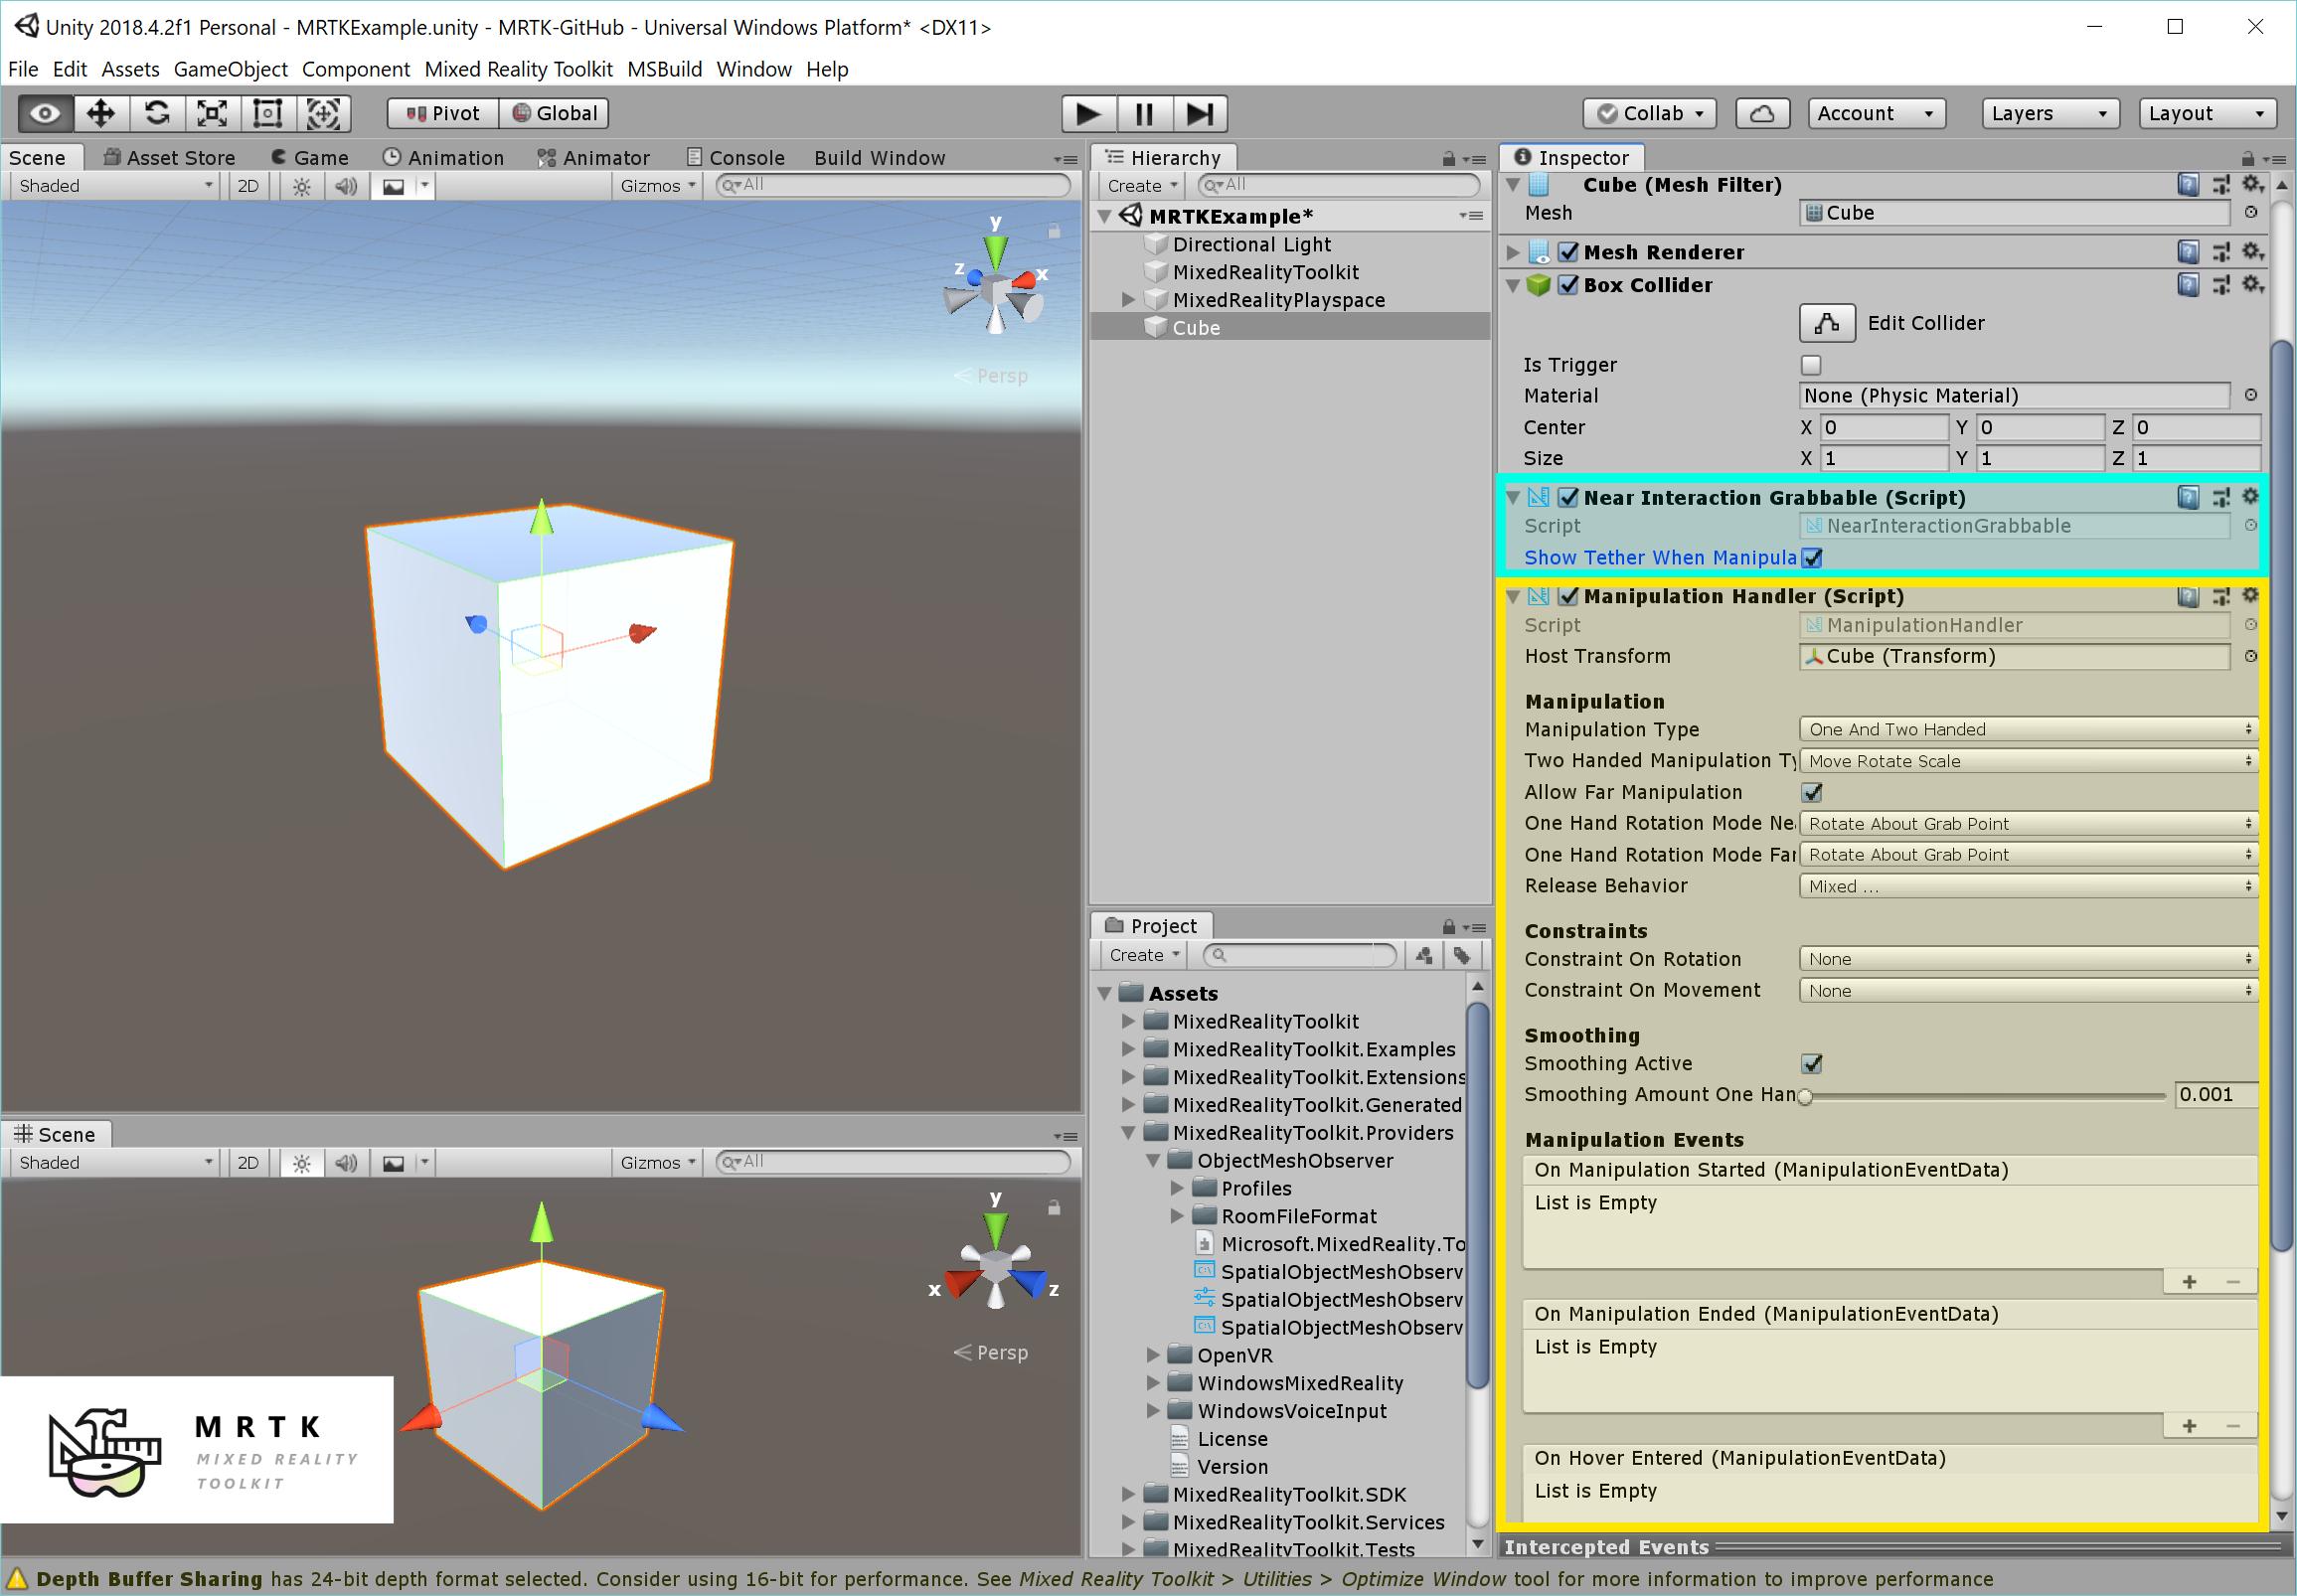 MRTK 101 - How to use Mixed Reality Toolkit Unity for Basic